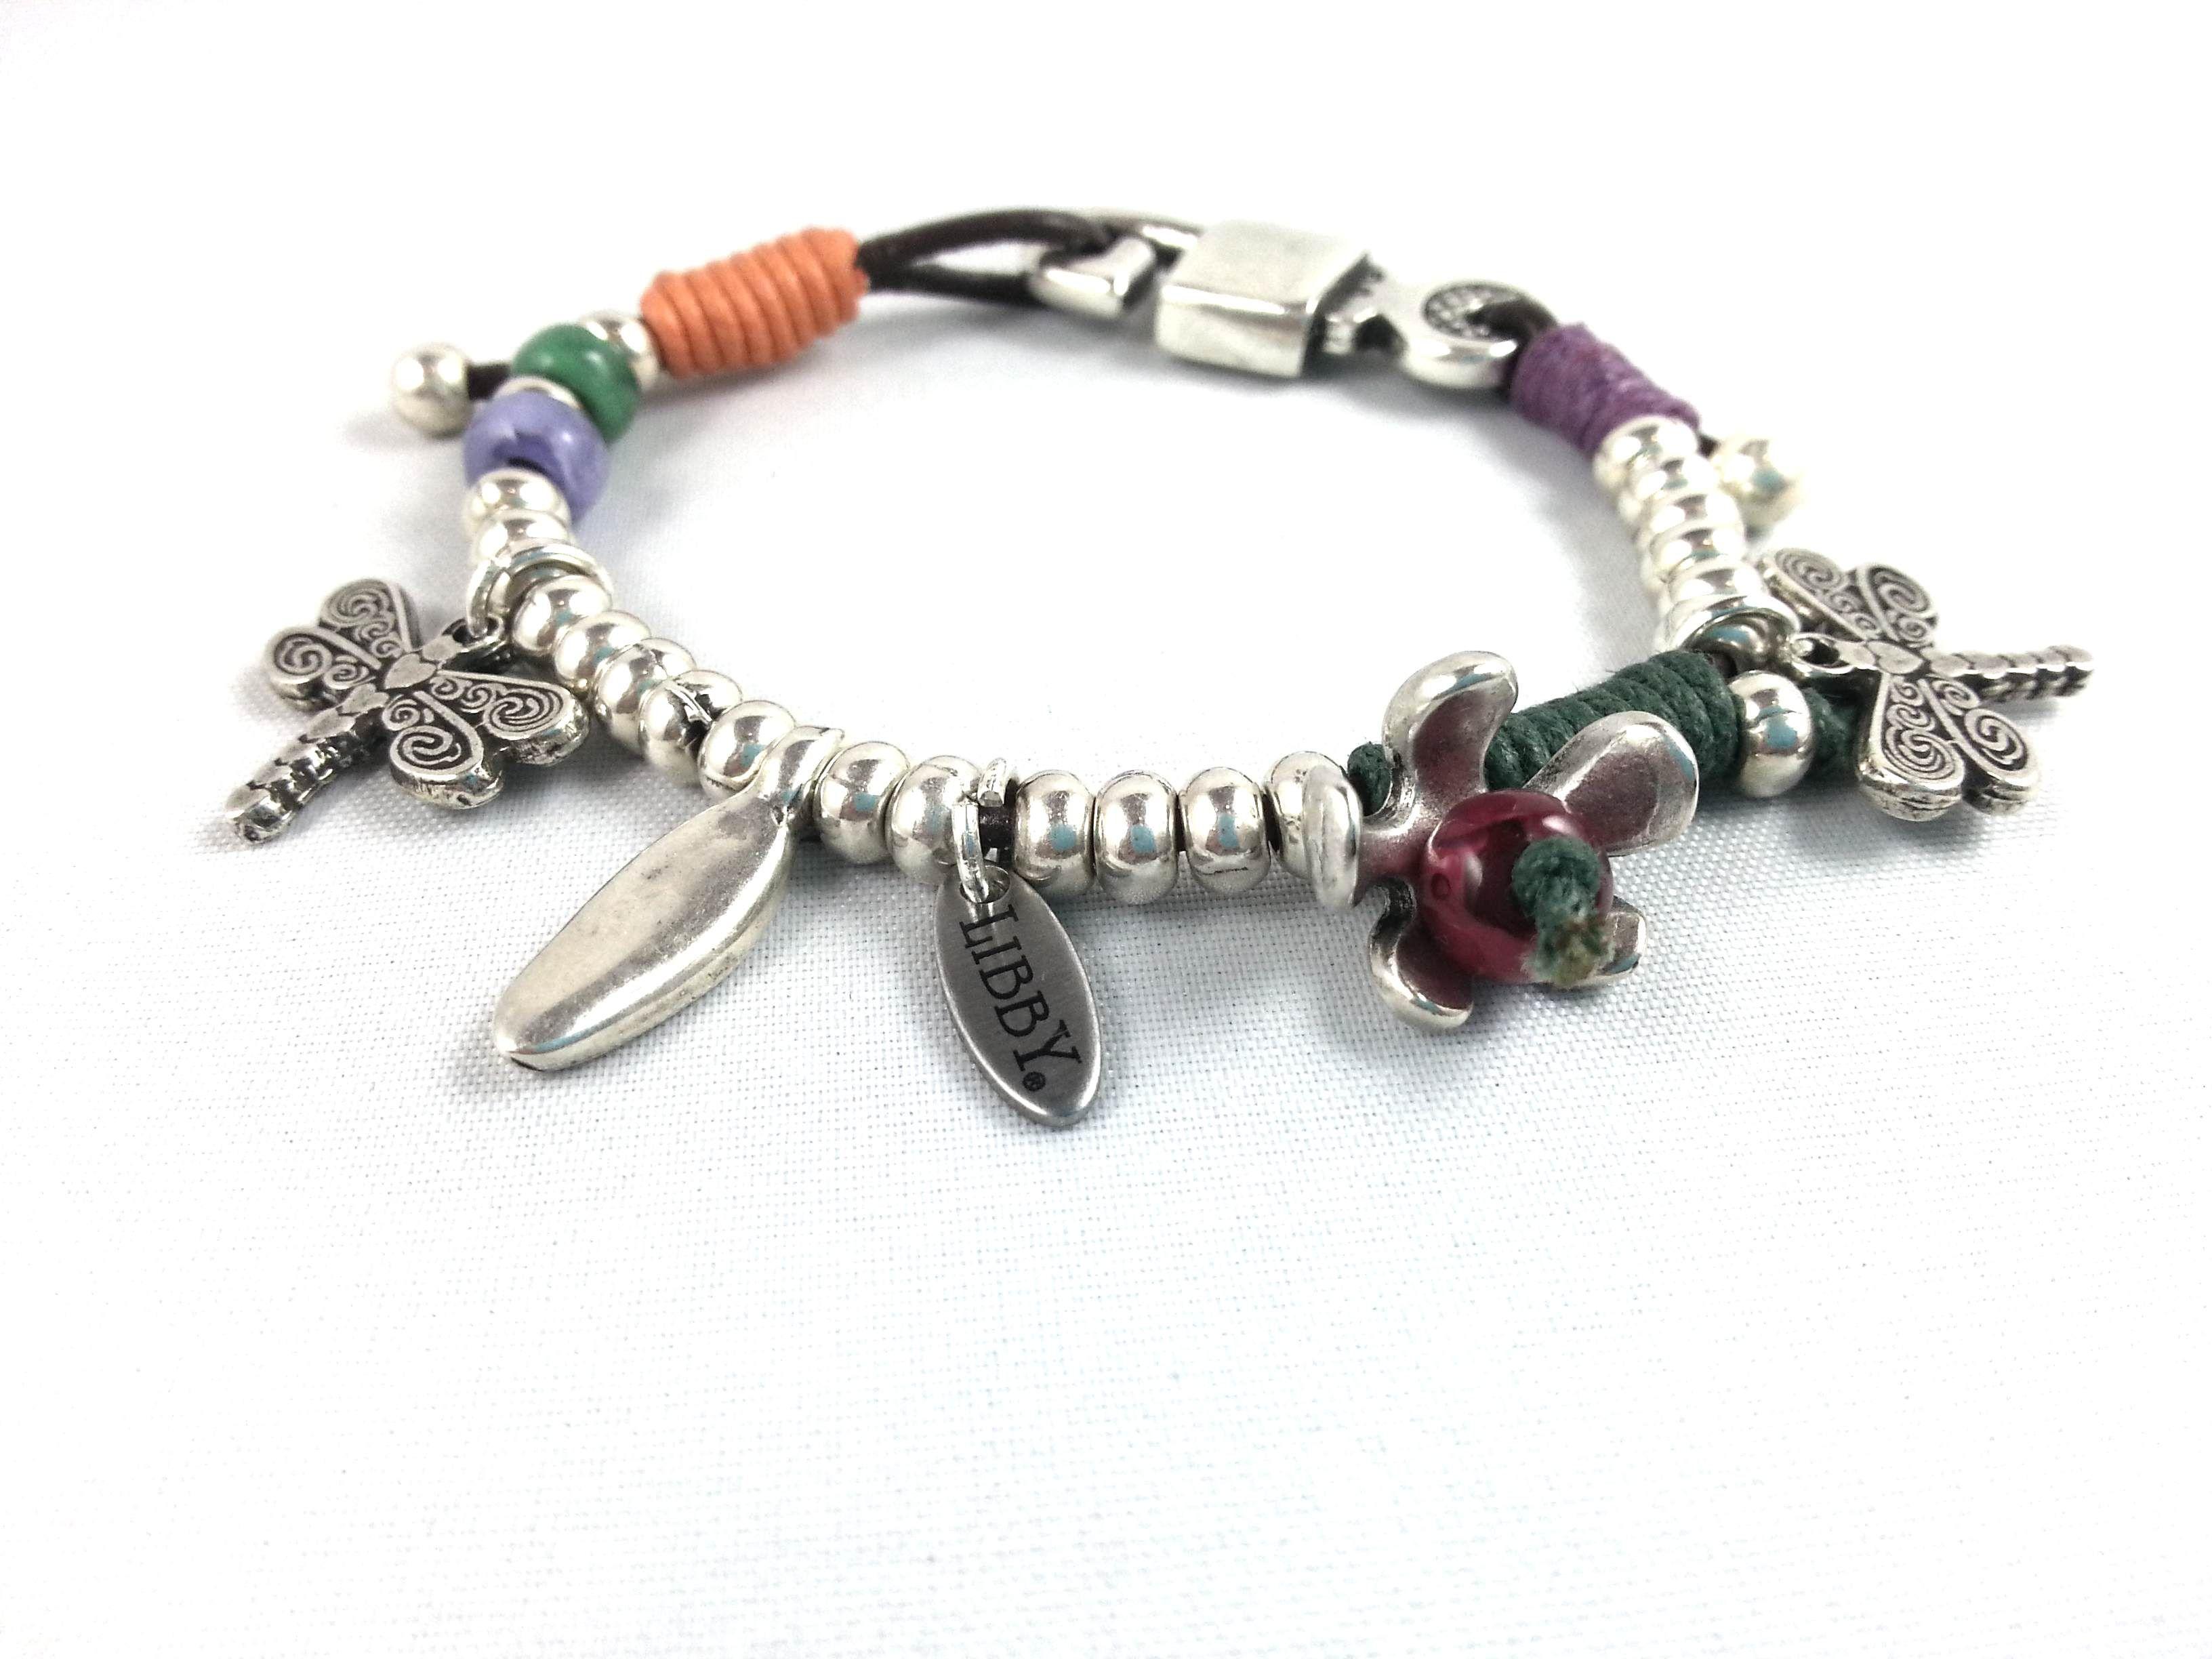 http://libbycomplements.com/pulseras/pulseras-ba-o-plata/pulsera-ba-ada-en-plata-y-resinas-e-hilos-de-colores